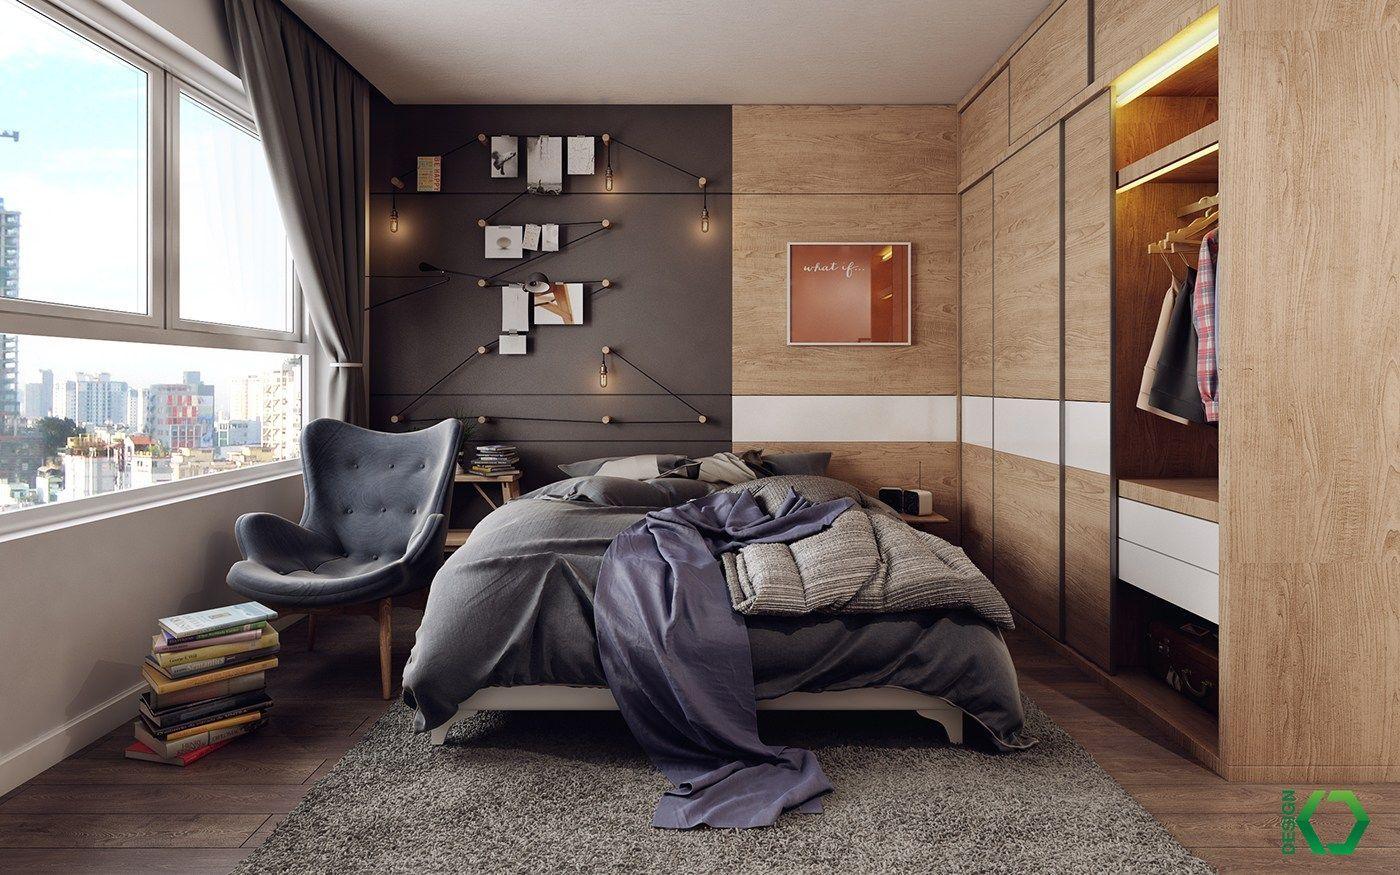 A Charming Eclectic Home Inspired By Nordic Design#designideas #designinspiration #designlovers #designersaree #designsponge #designersarees #designbuild #designersuits #fashionmuslim #scandinaviandesign #industrialdesign #nailsdesign #nailartist